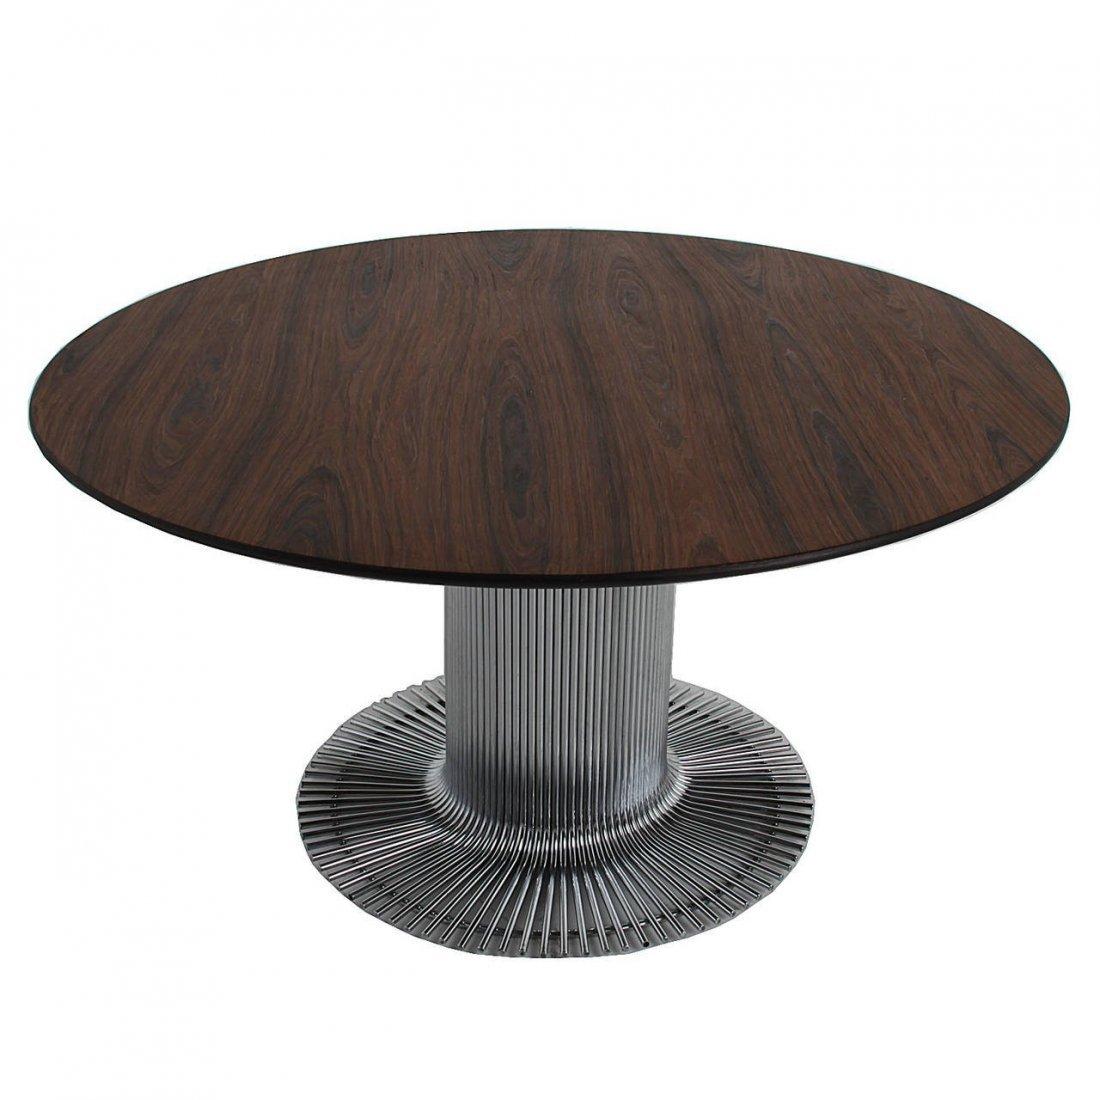 Brazilian Rosewood Table - 4